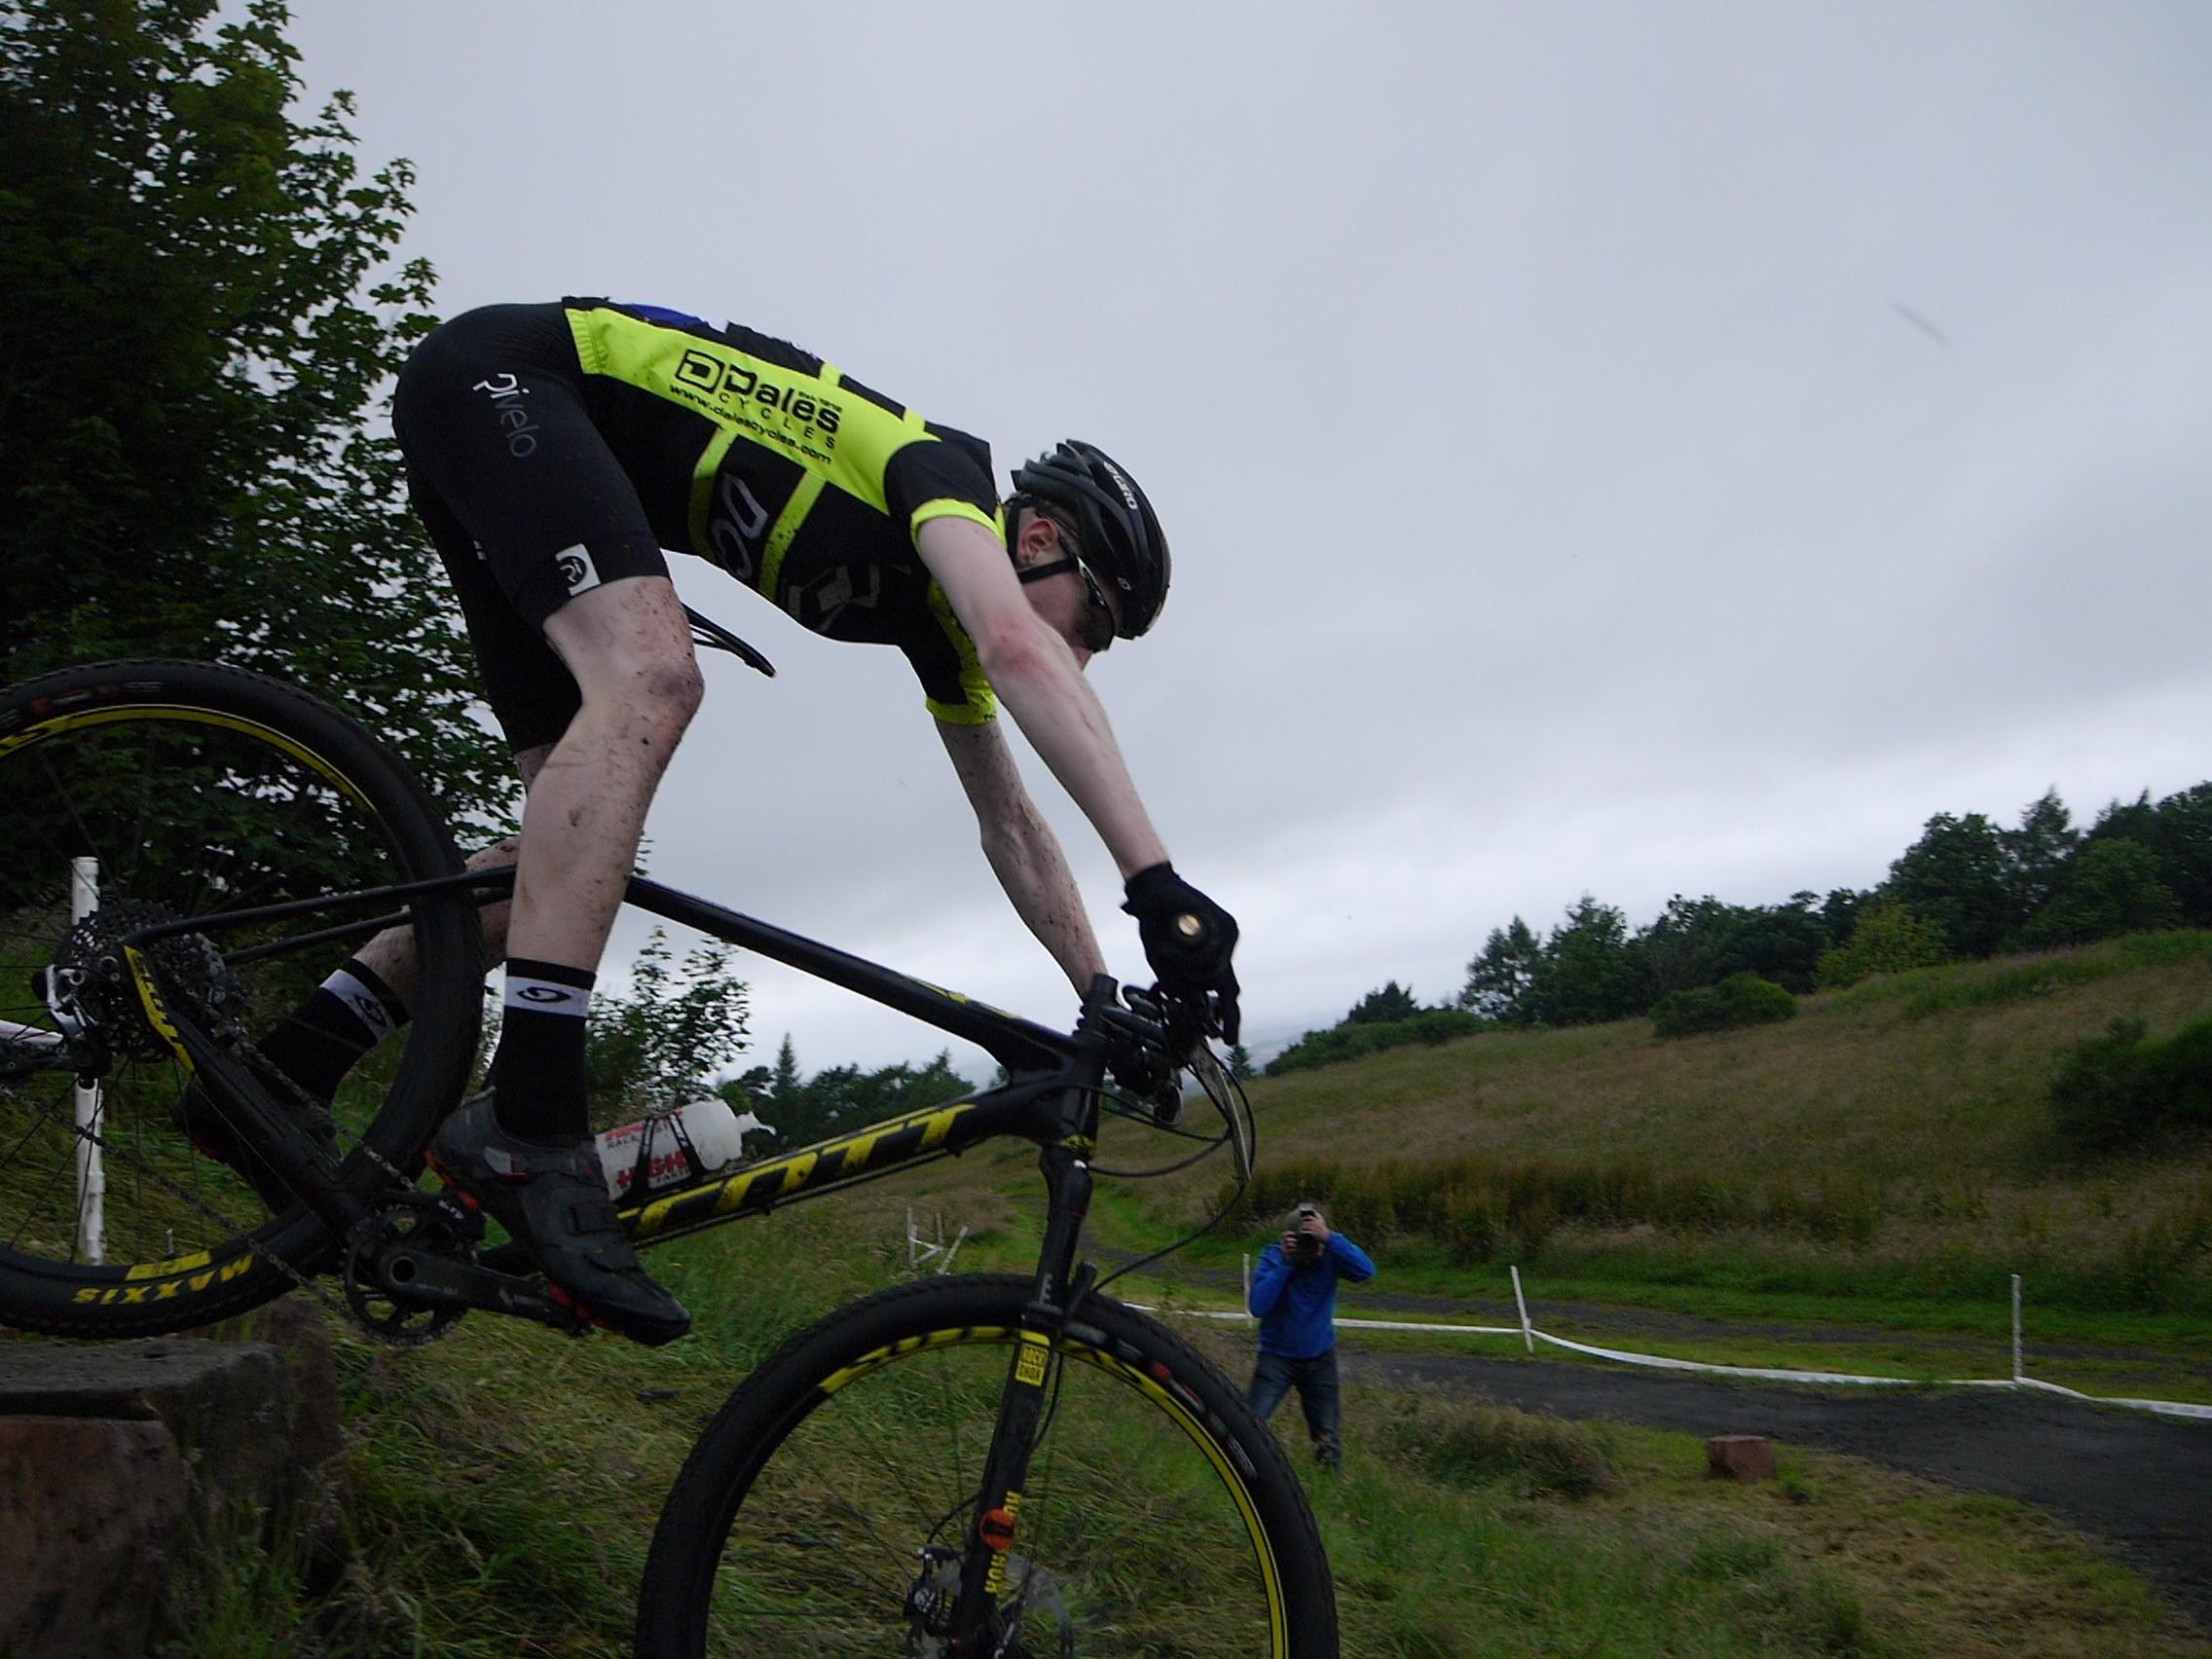 Tim Shoreman DCRT rider